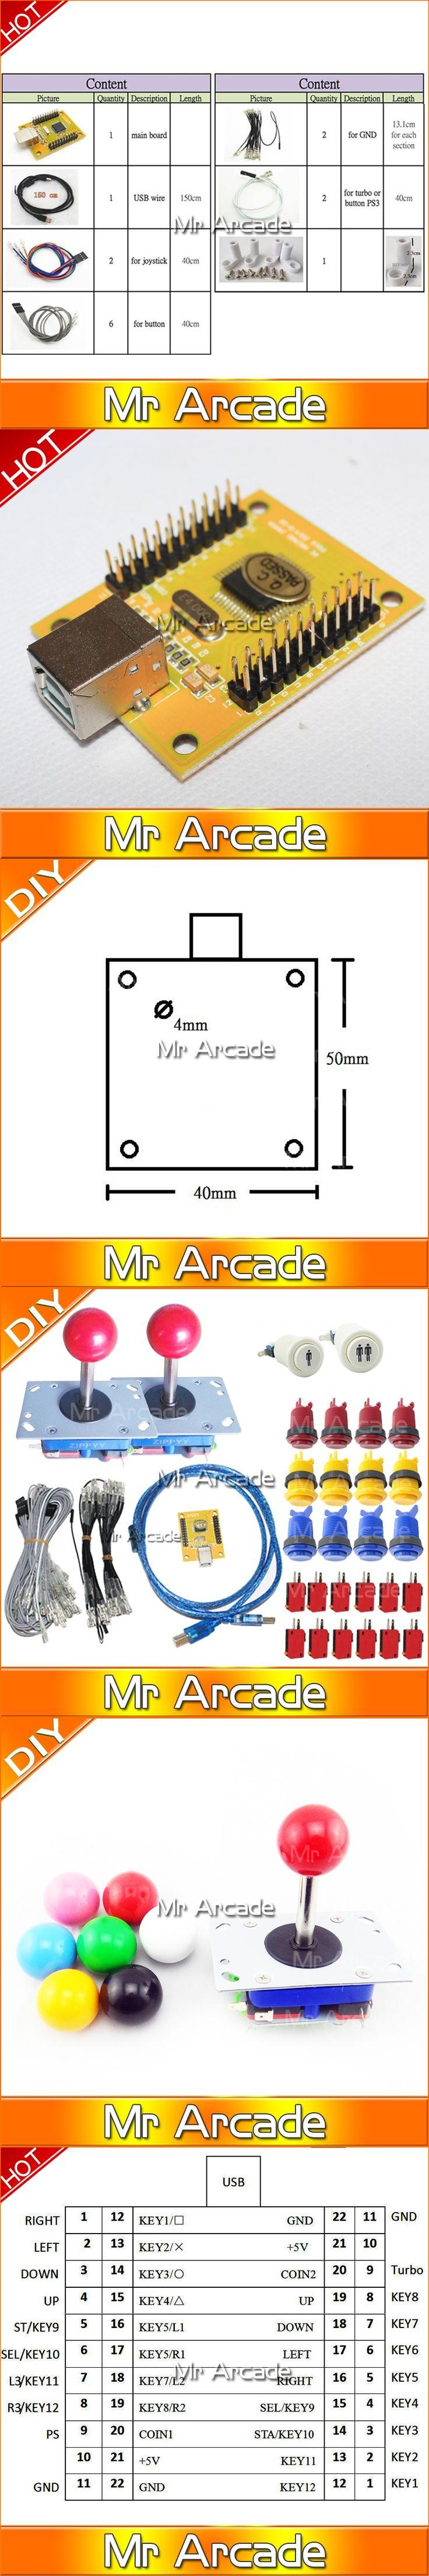 DIY PC PS/3 2 IN 1 Arcade controller 2 player MAME Multicade Keyboard Encoder USB Jamma Happy Style Push Buttons ZIPPYY Joystick